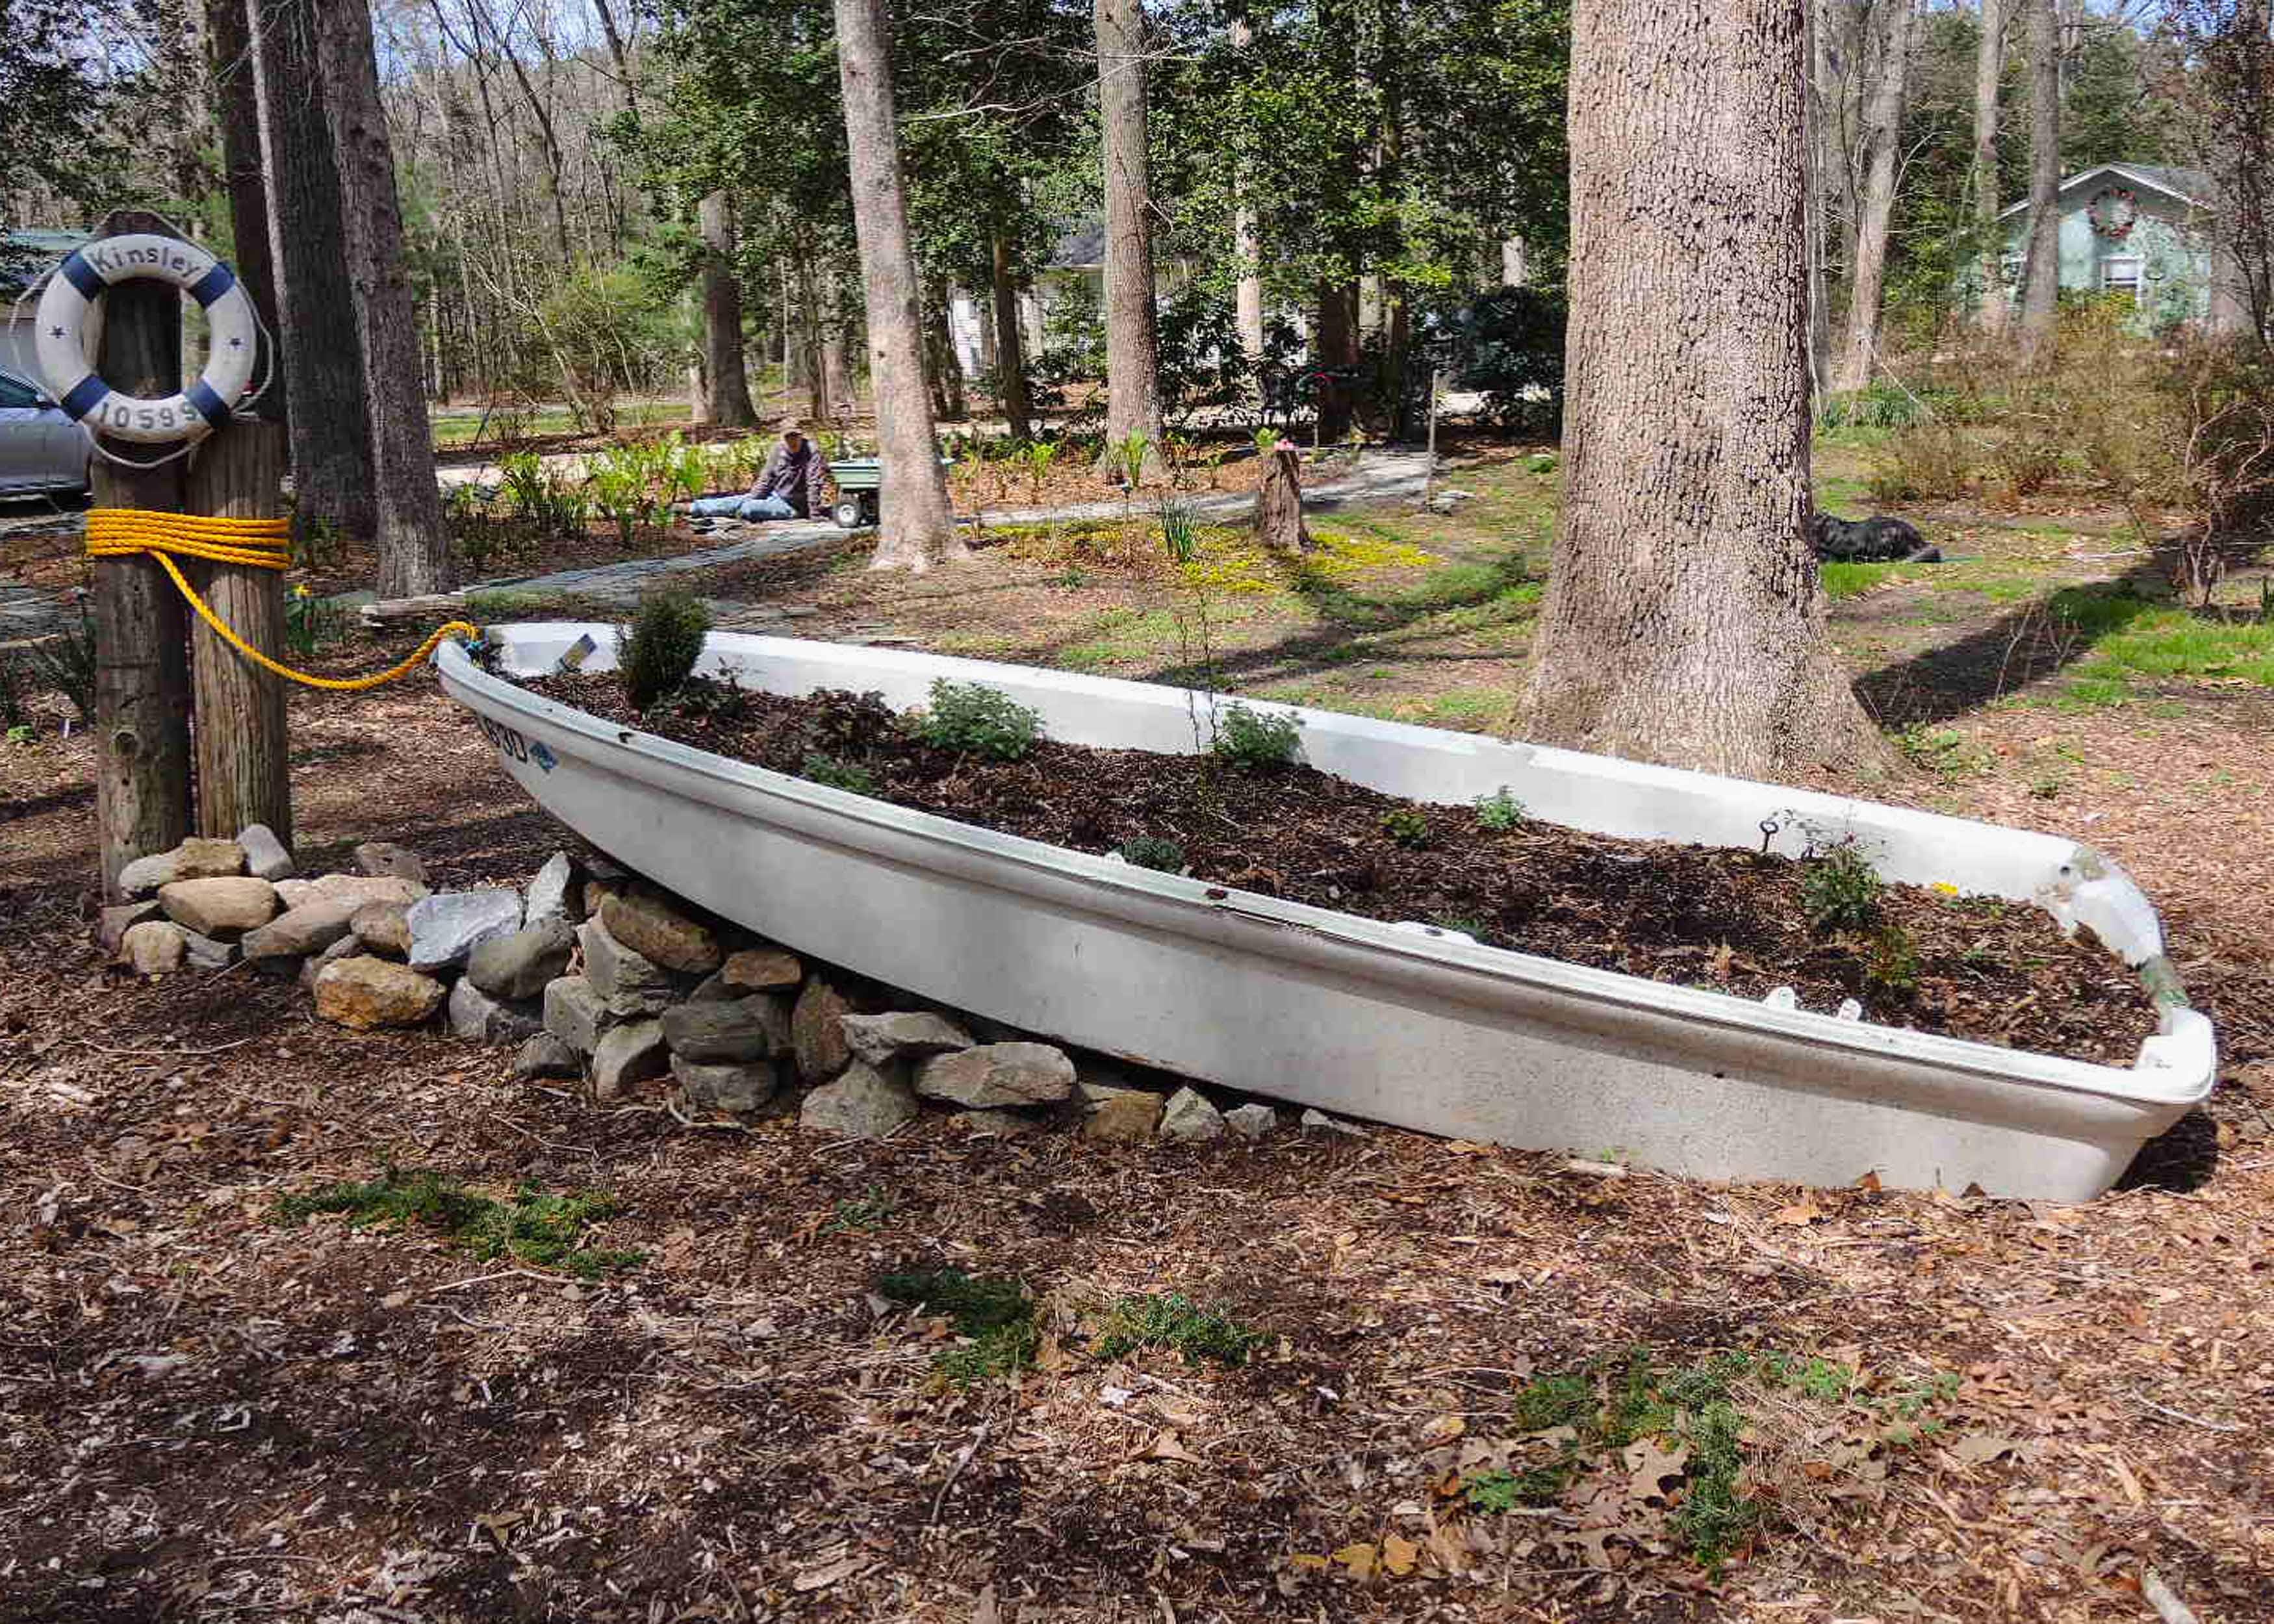 DSCN9928 - John & Carol's boat planter.jpg